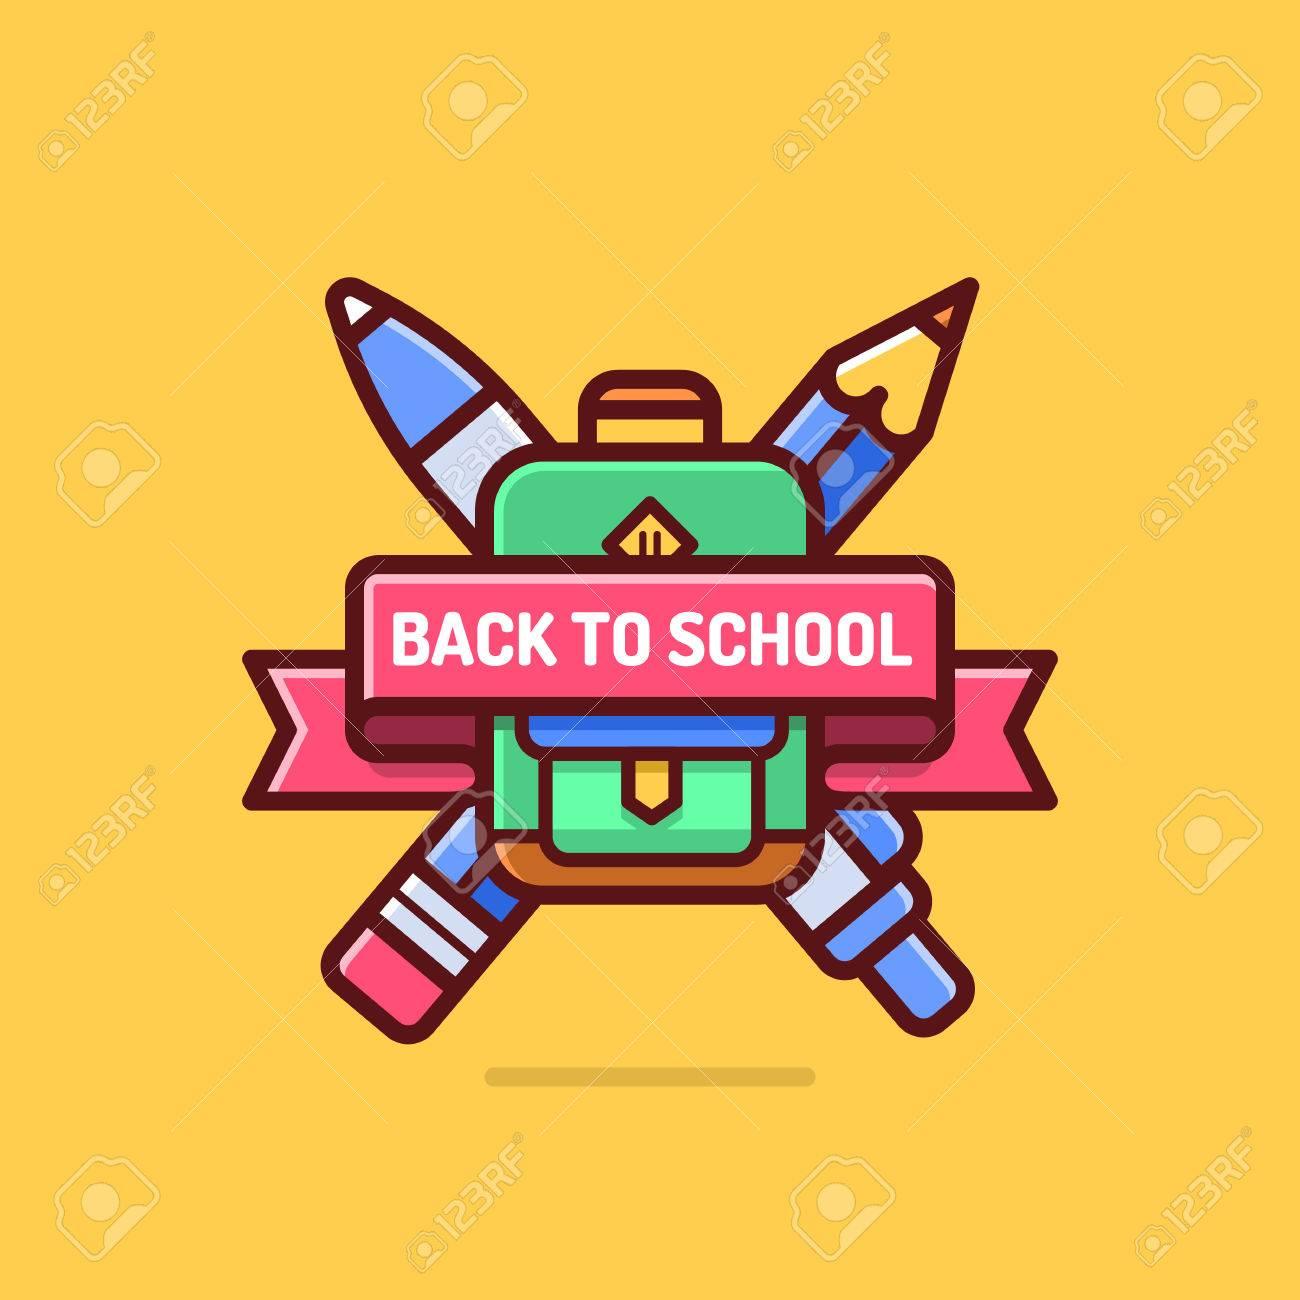 Back To School Badge. Cool Trendy School Logo With Ribbon f51f9210188e2